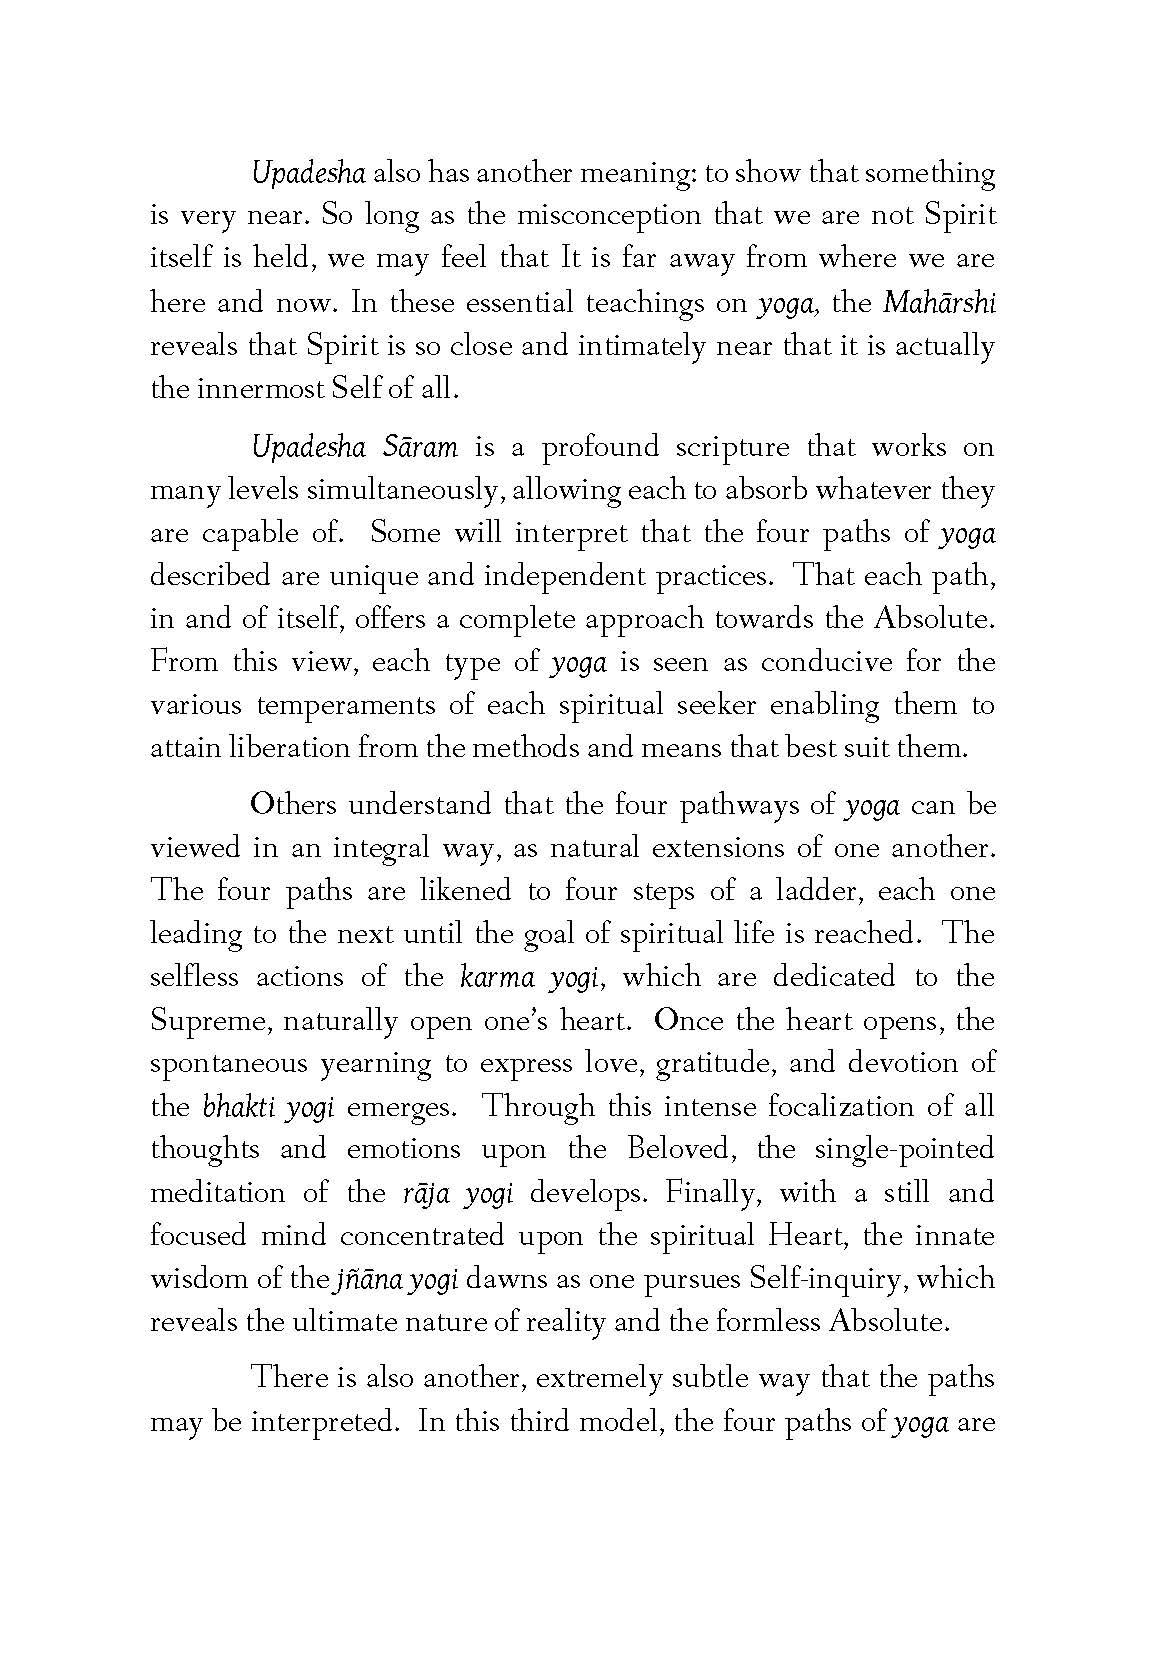 Awakening the Bliss of Being - PDF Download_Page_009